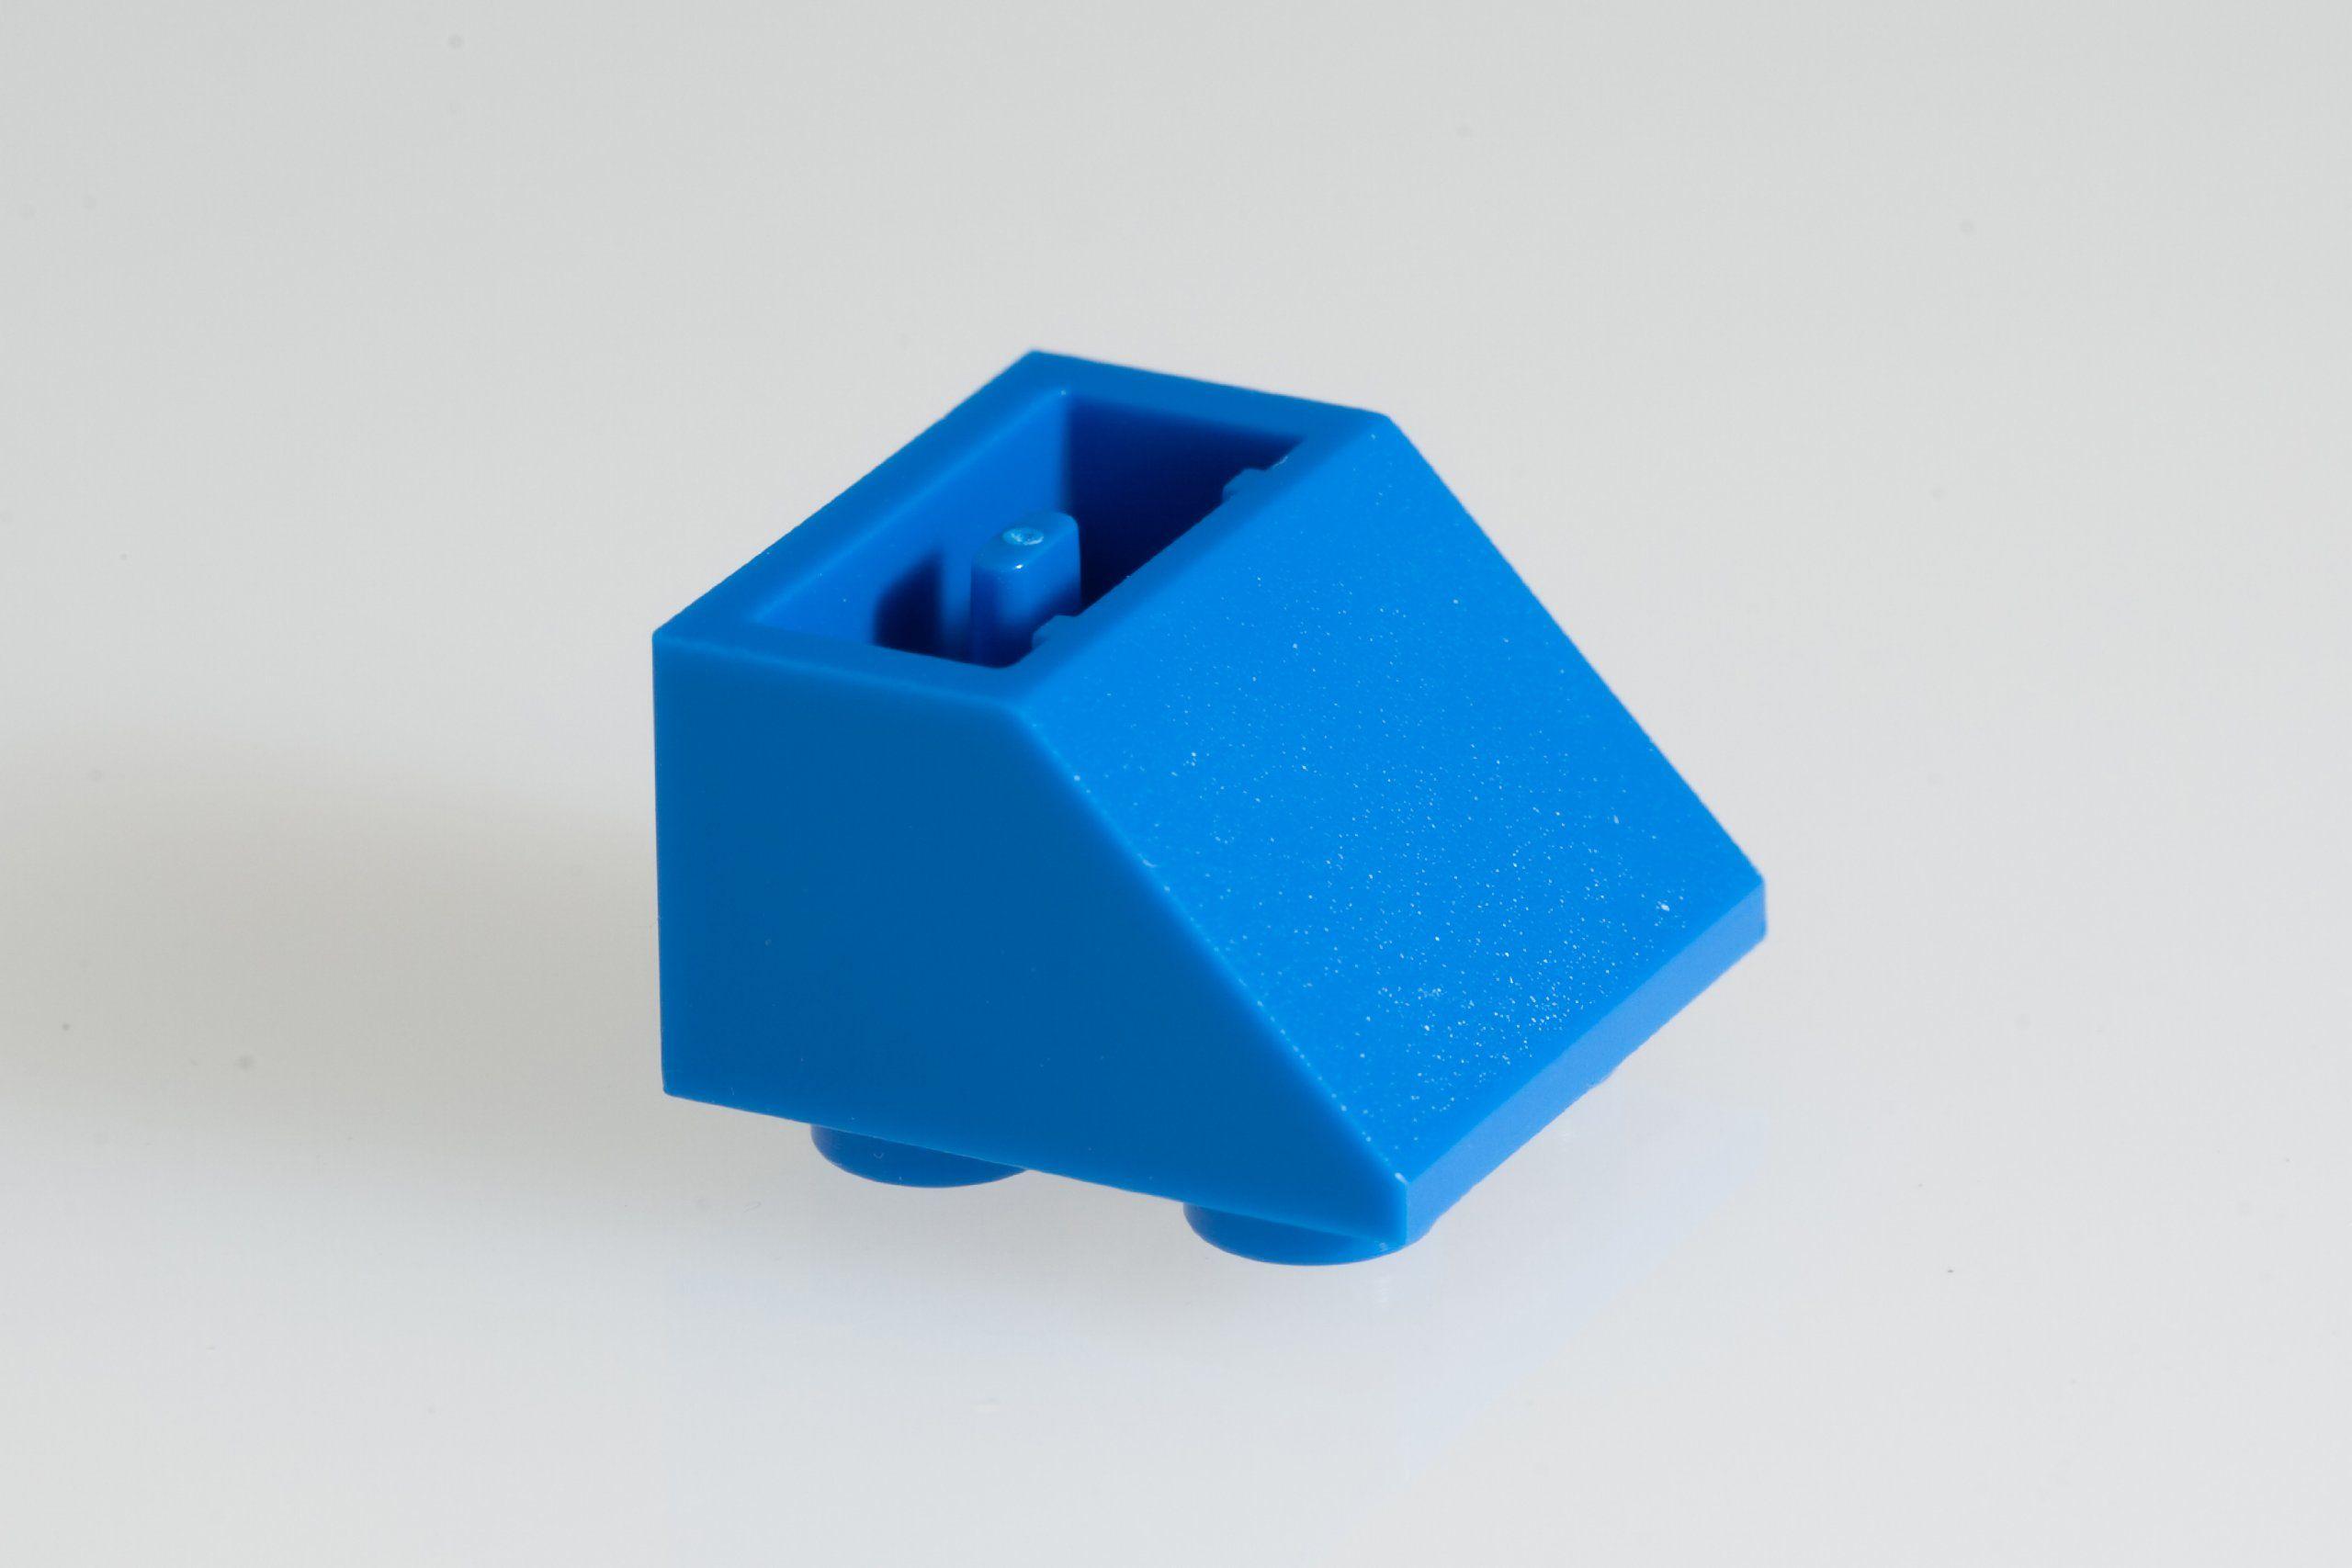 100x Lego Bright Blue Blue 2x2 45 Deg Inv Roof Tiles Super Pack Lego Roof Tiles Bright Blue